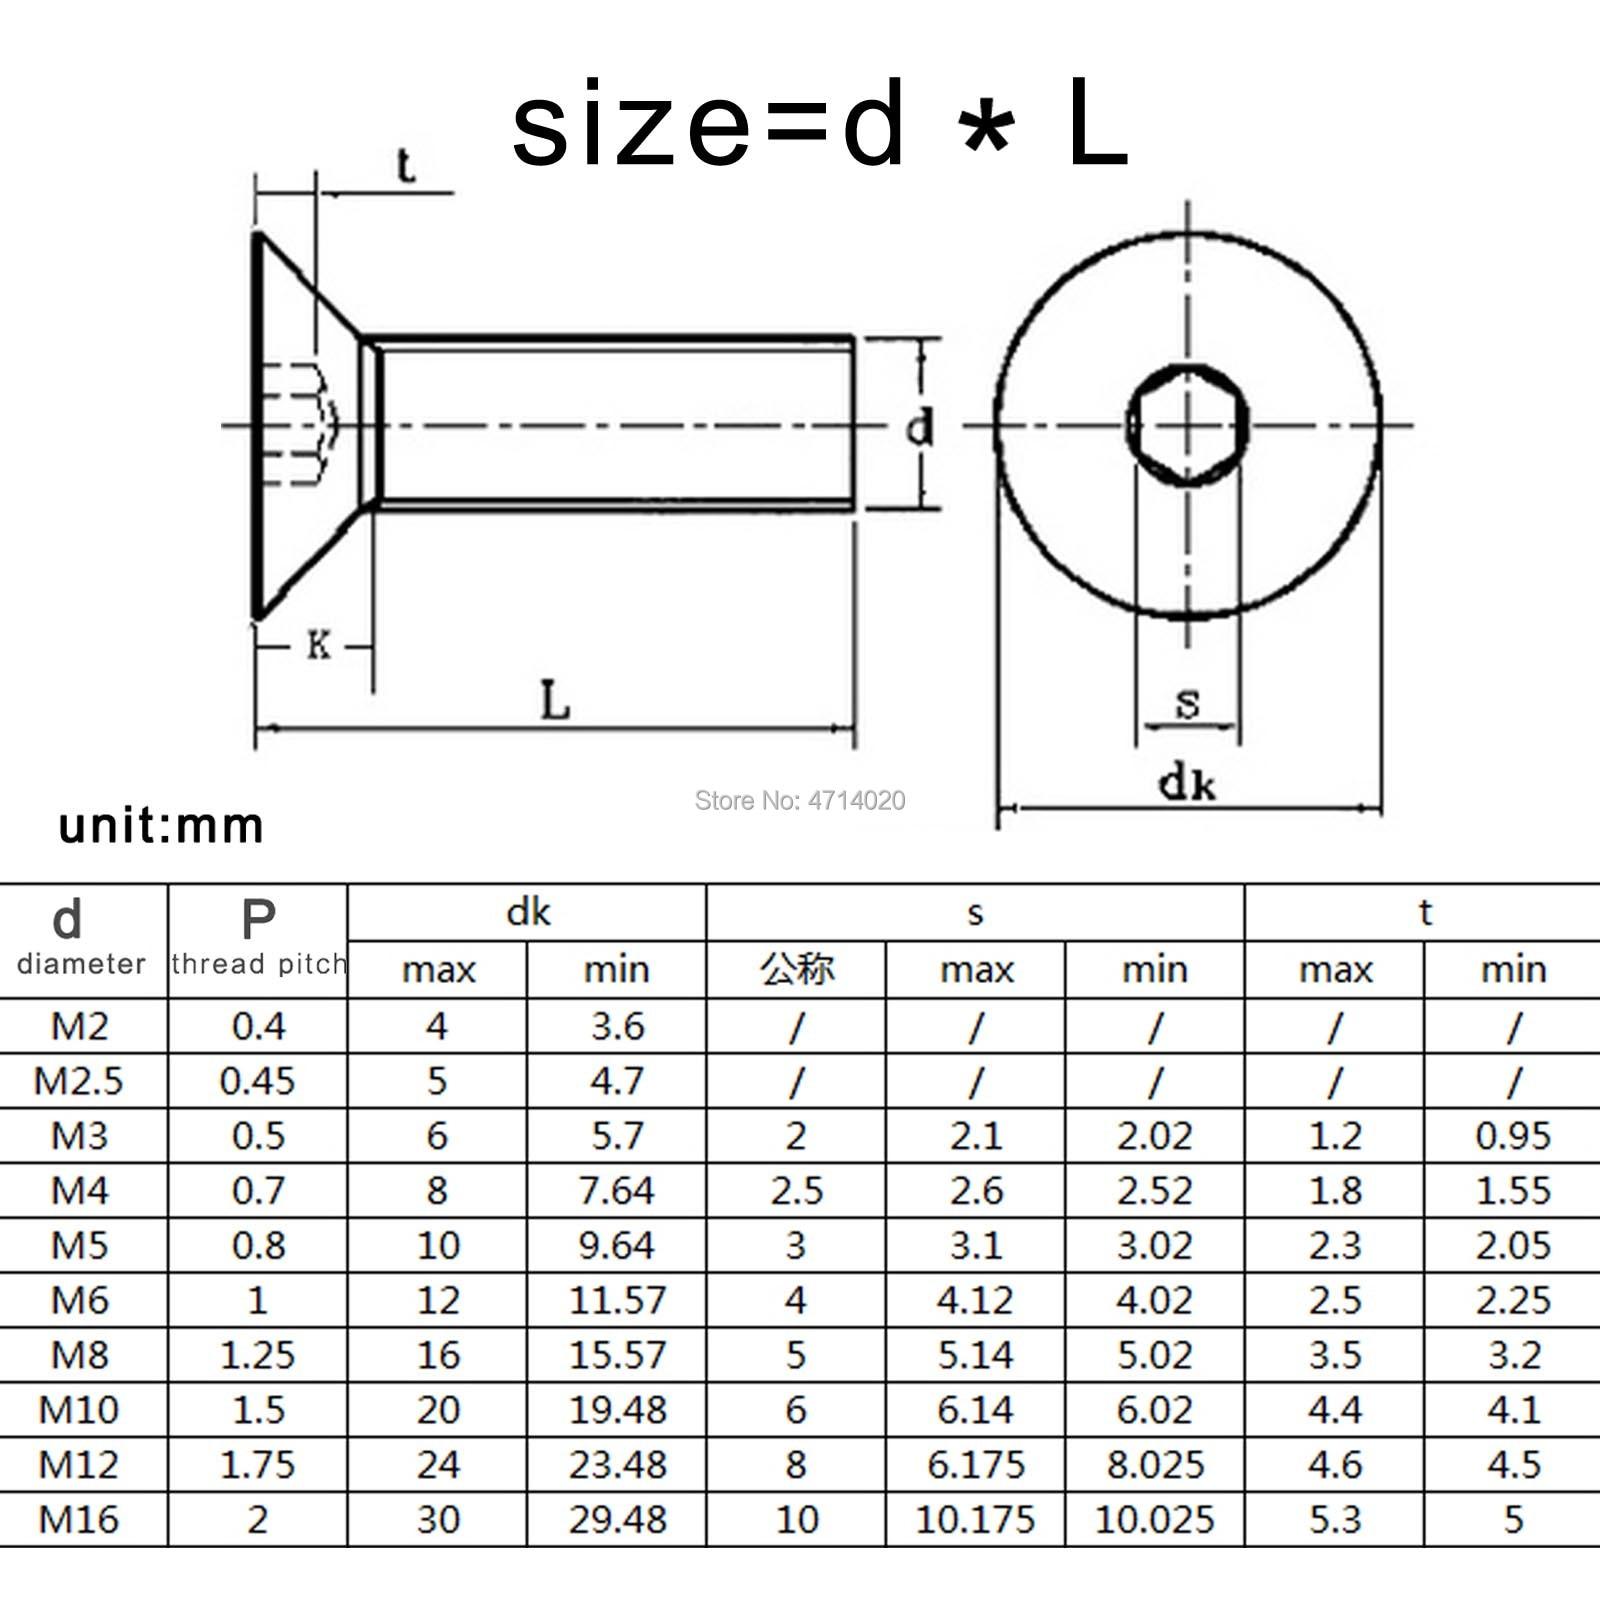 45 Thread Size M2 5-0 Alloy Steel Socket Head Screw